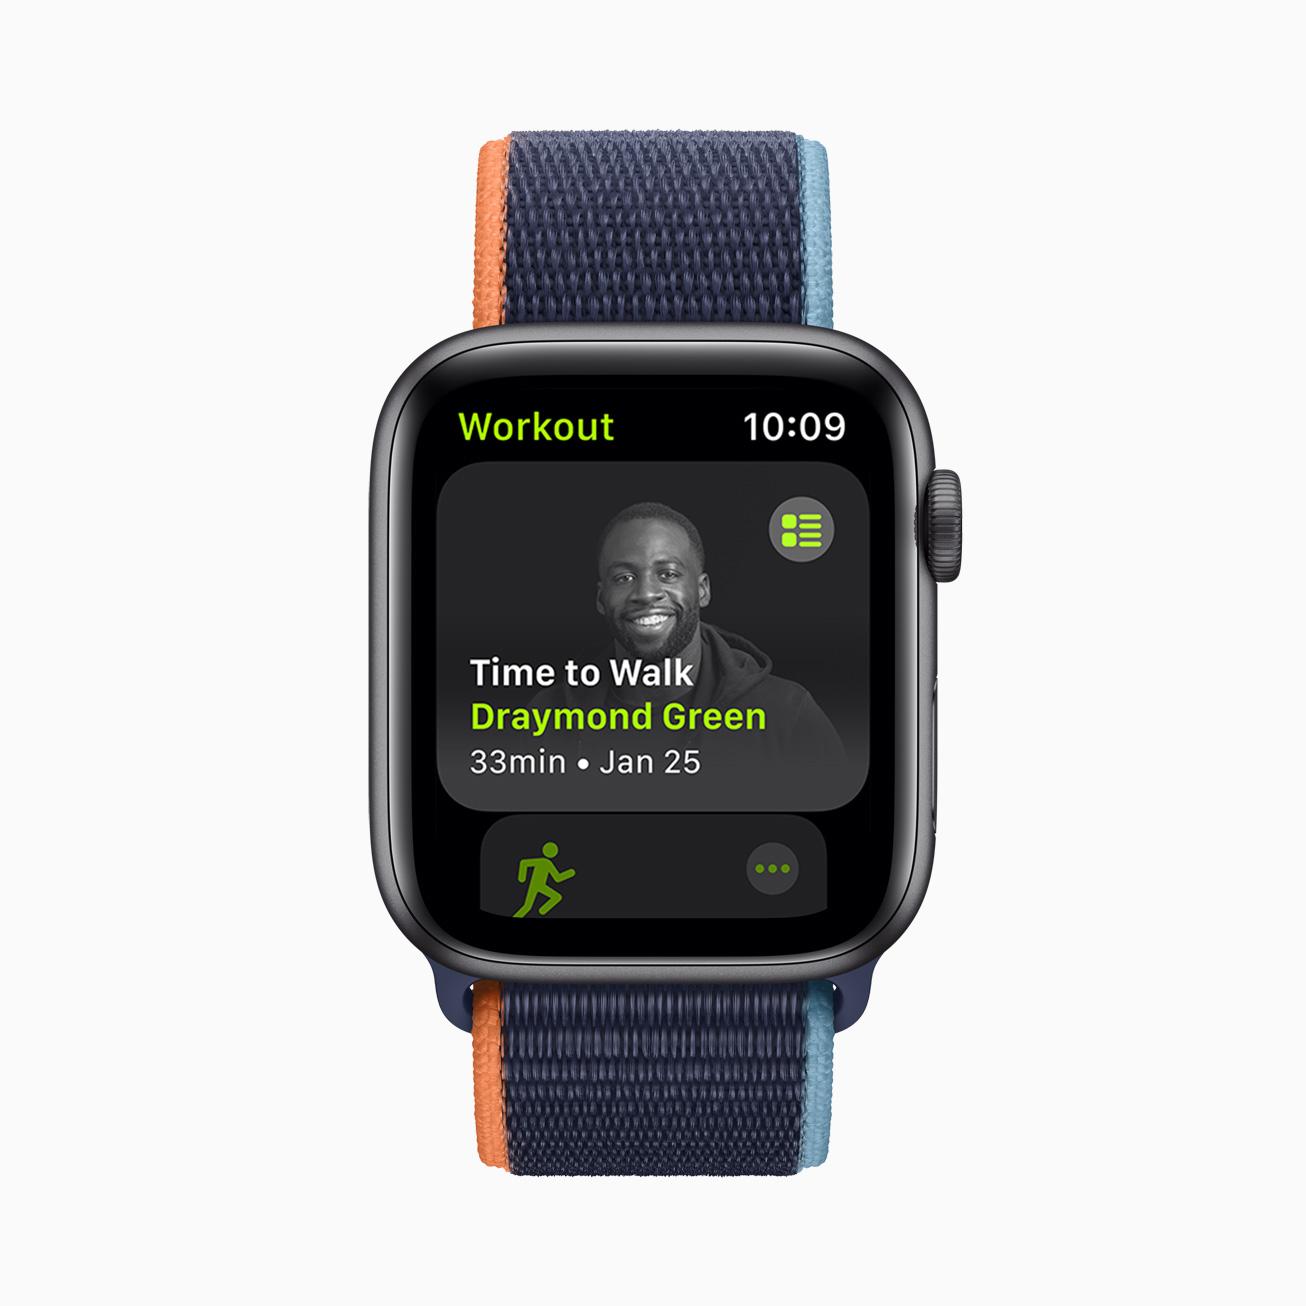 apple_time-to-walk_apple-watch-draymond-green_01252021_carousel.jpg.large_2x.jpg